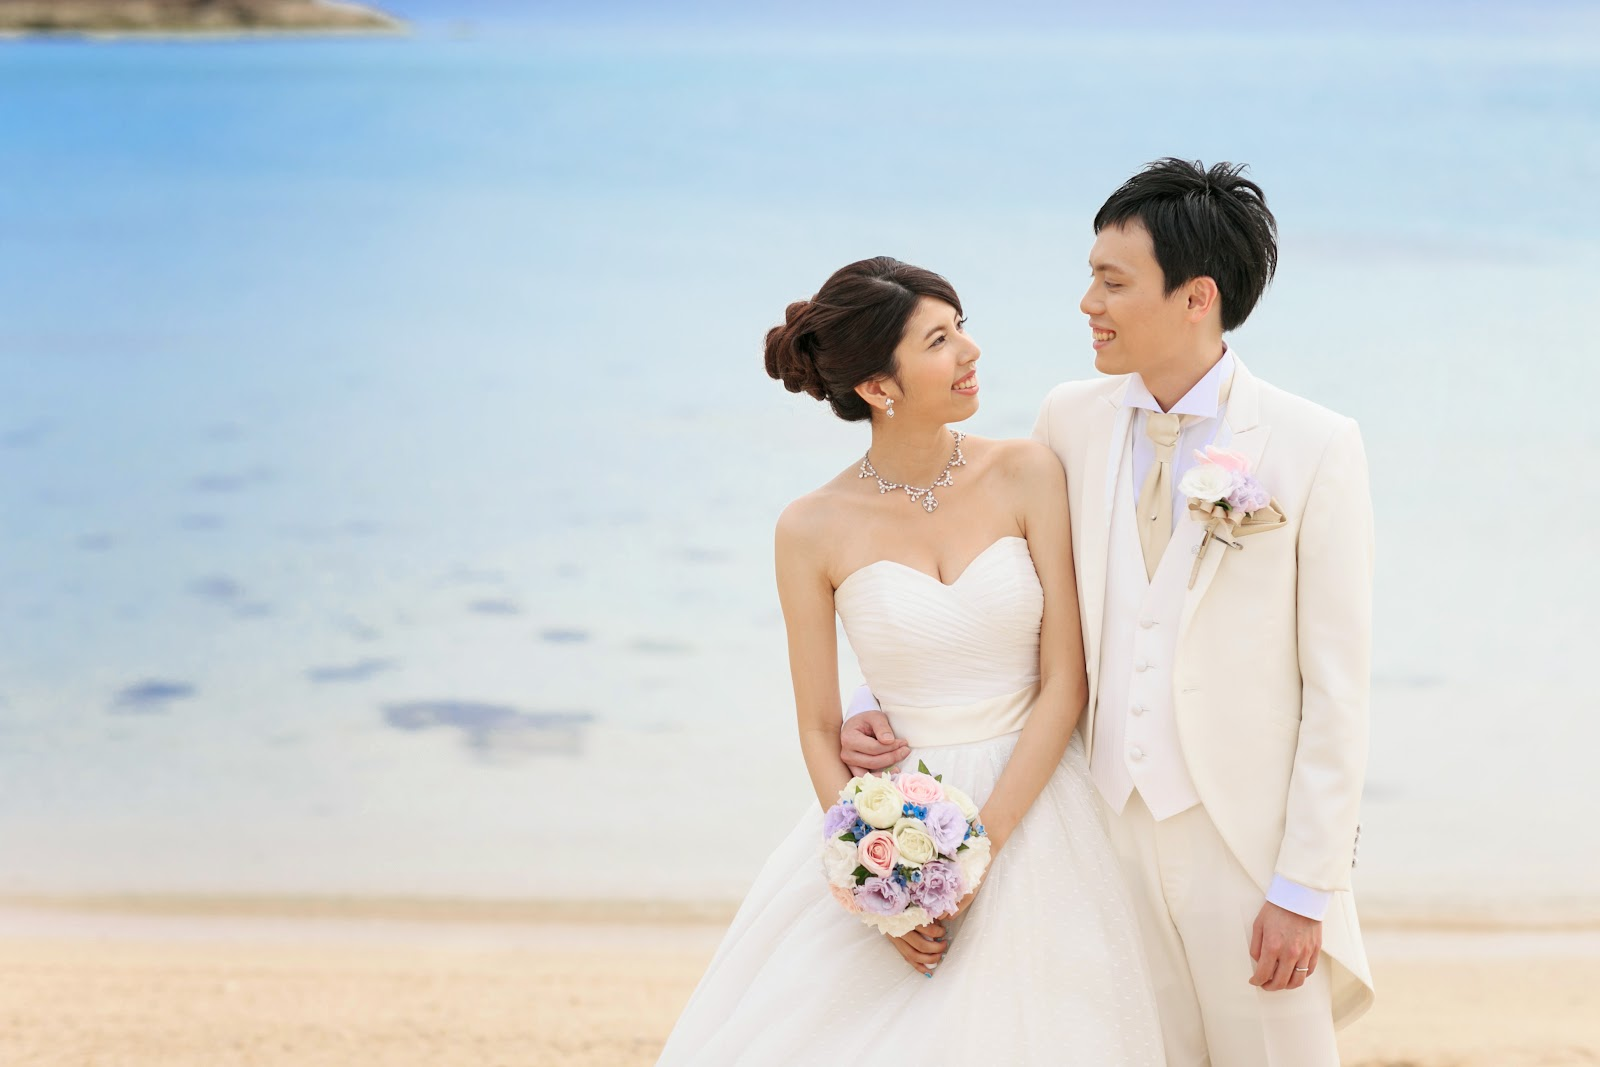 Keep smiling.: 【我的超完美沖繩婚禮】Part6 海外婚禮多少錢?